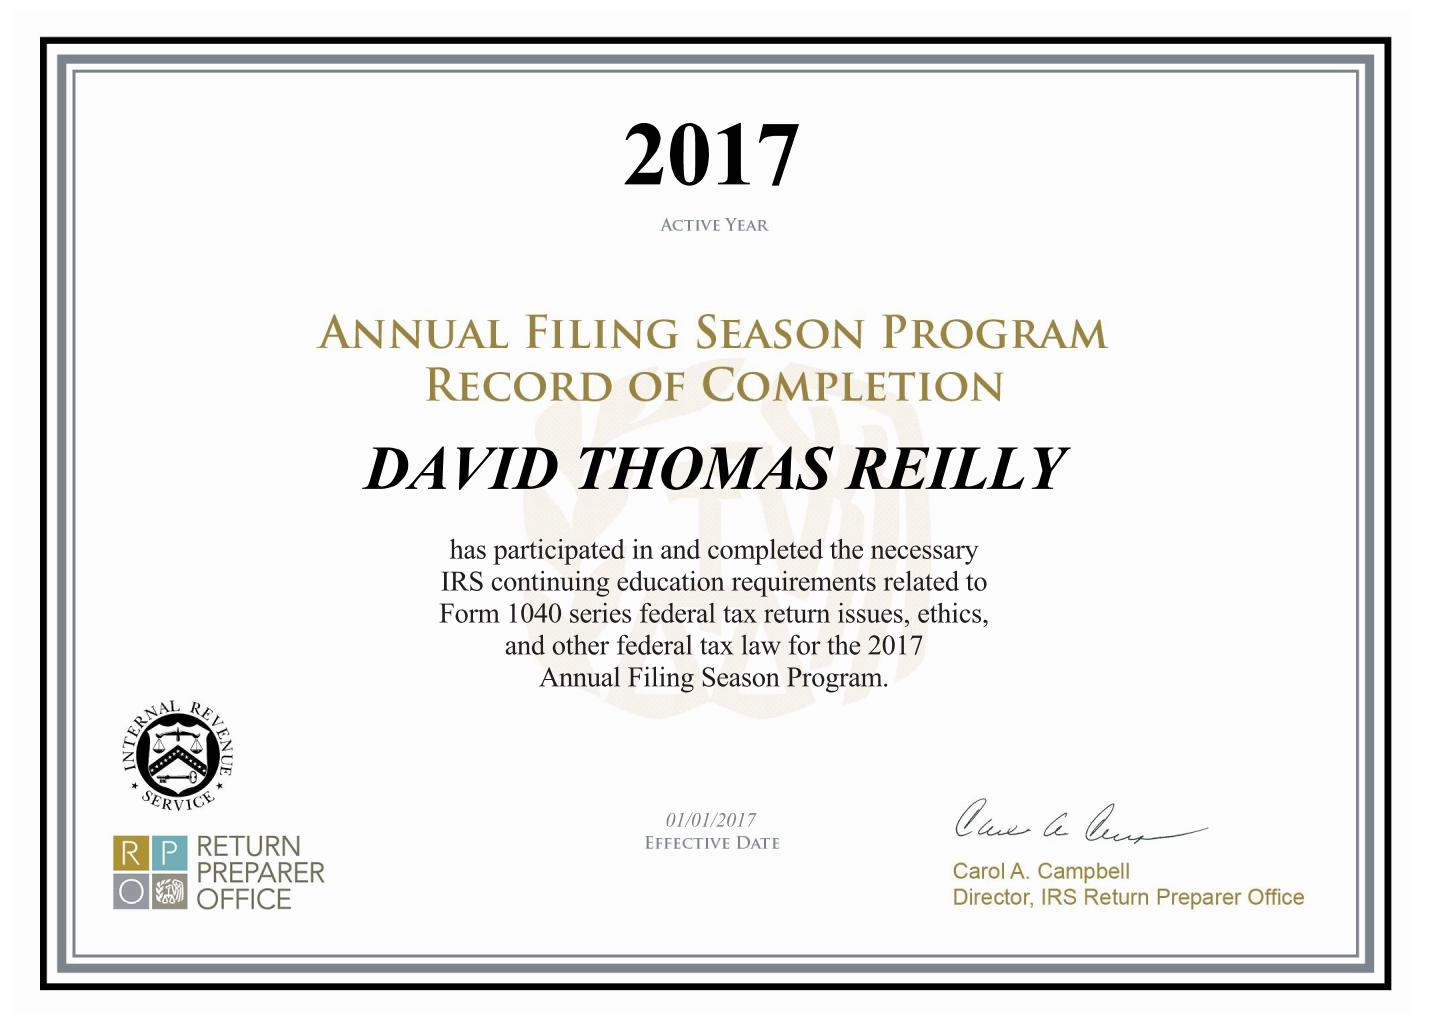 2017 AFSP Certificate